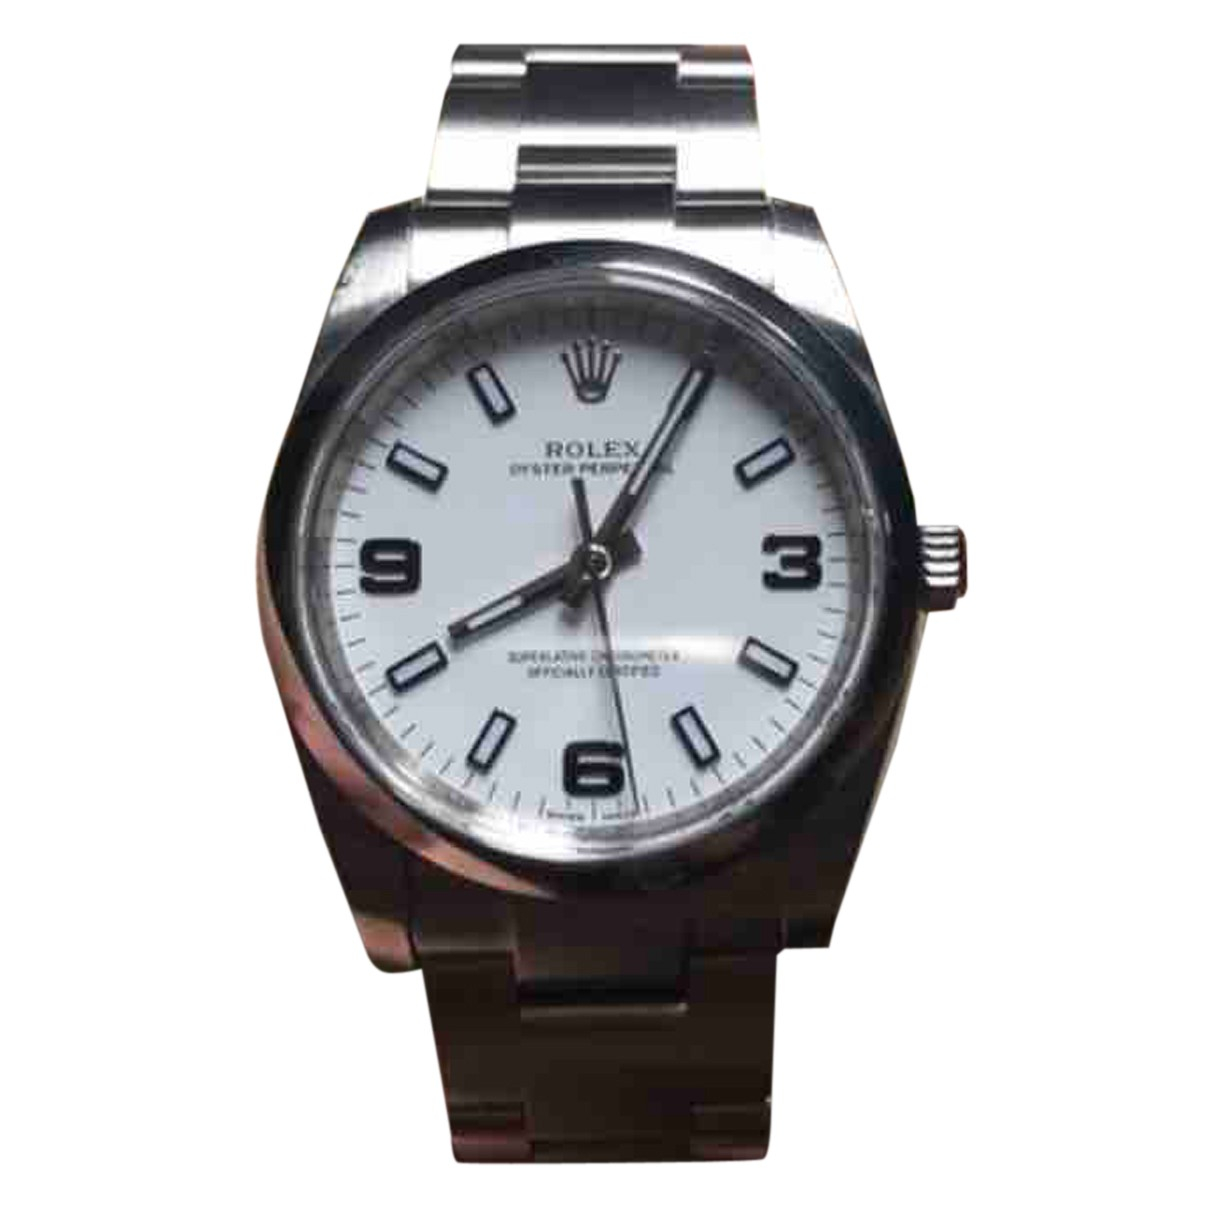 Reloj Oyster Perpetual 36mm Rolex